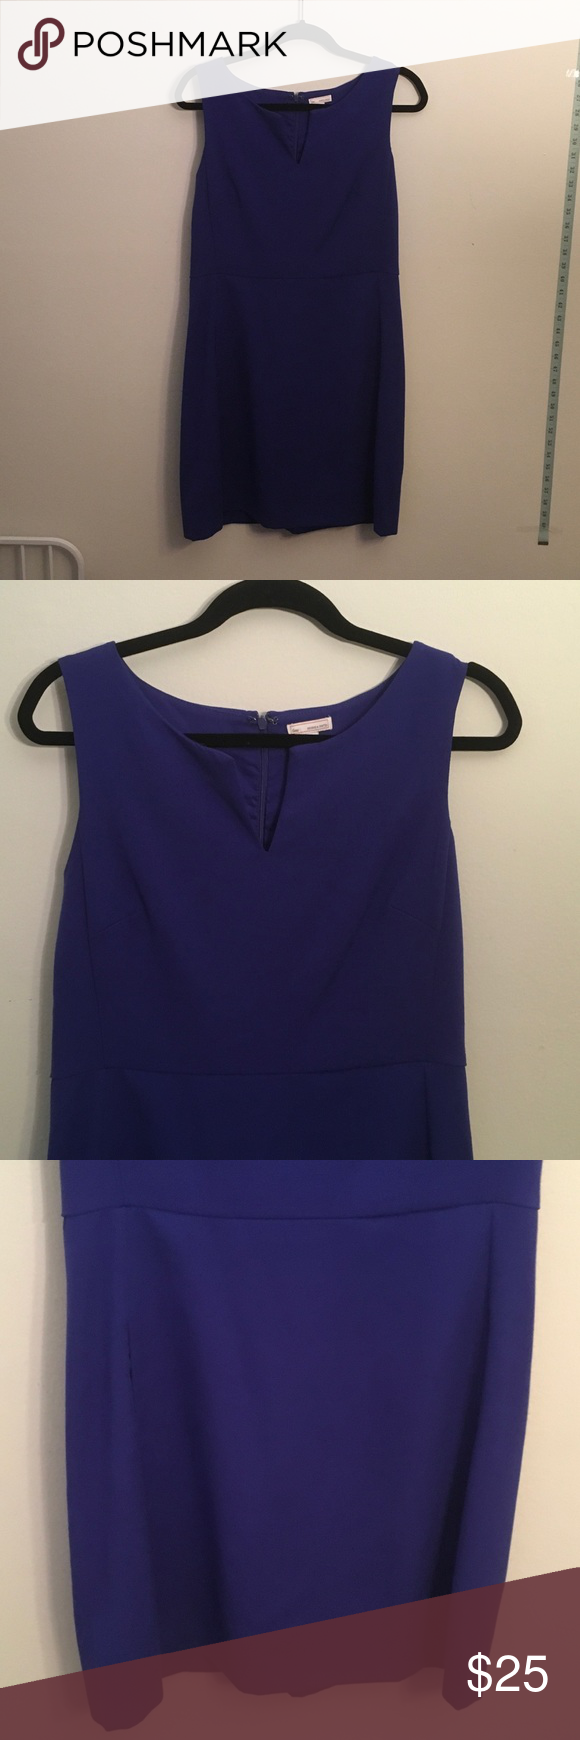 Blue dress Great condition, back zipper, has pockets GAP Dresses Midi